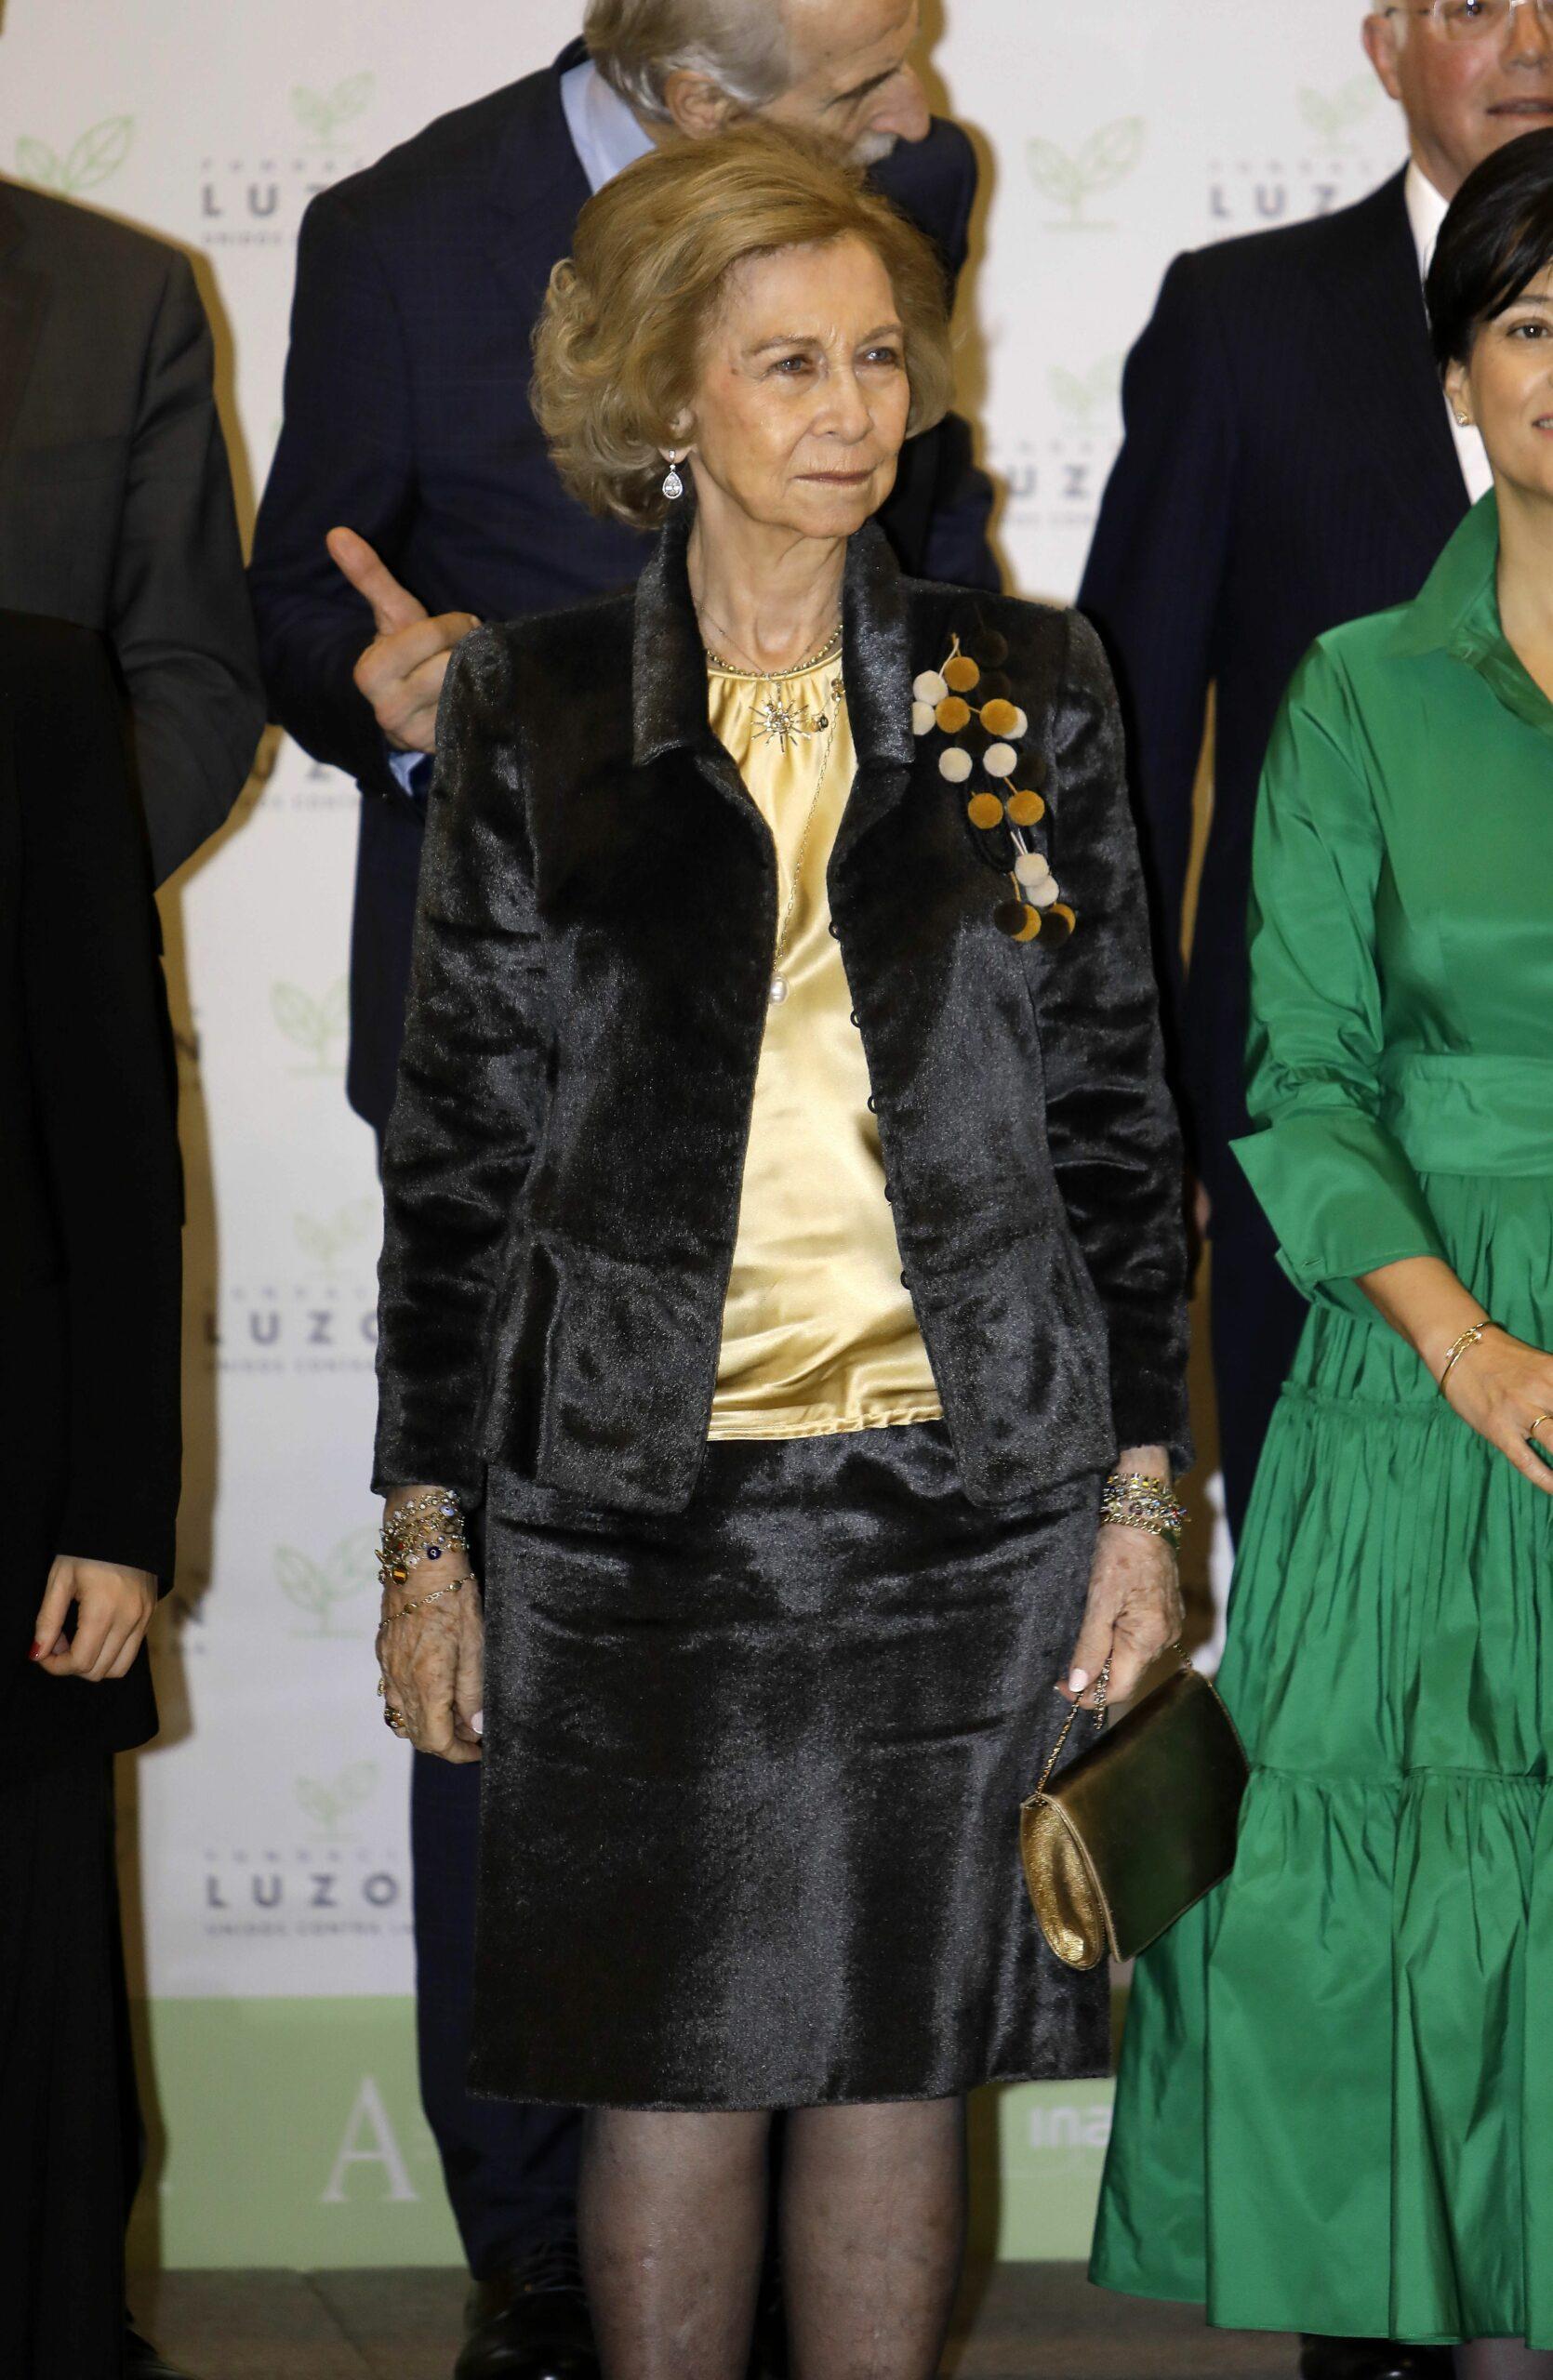 La reina Sofia, de concert   Europa Press